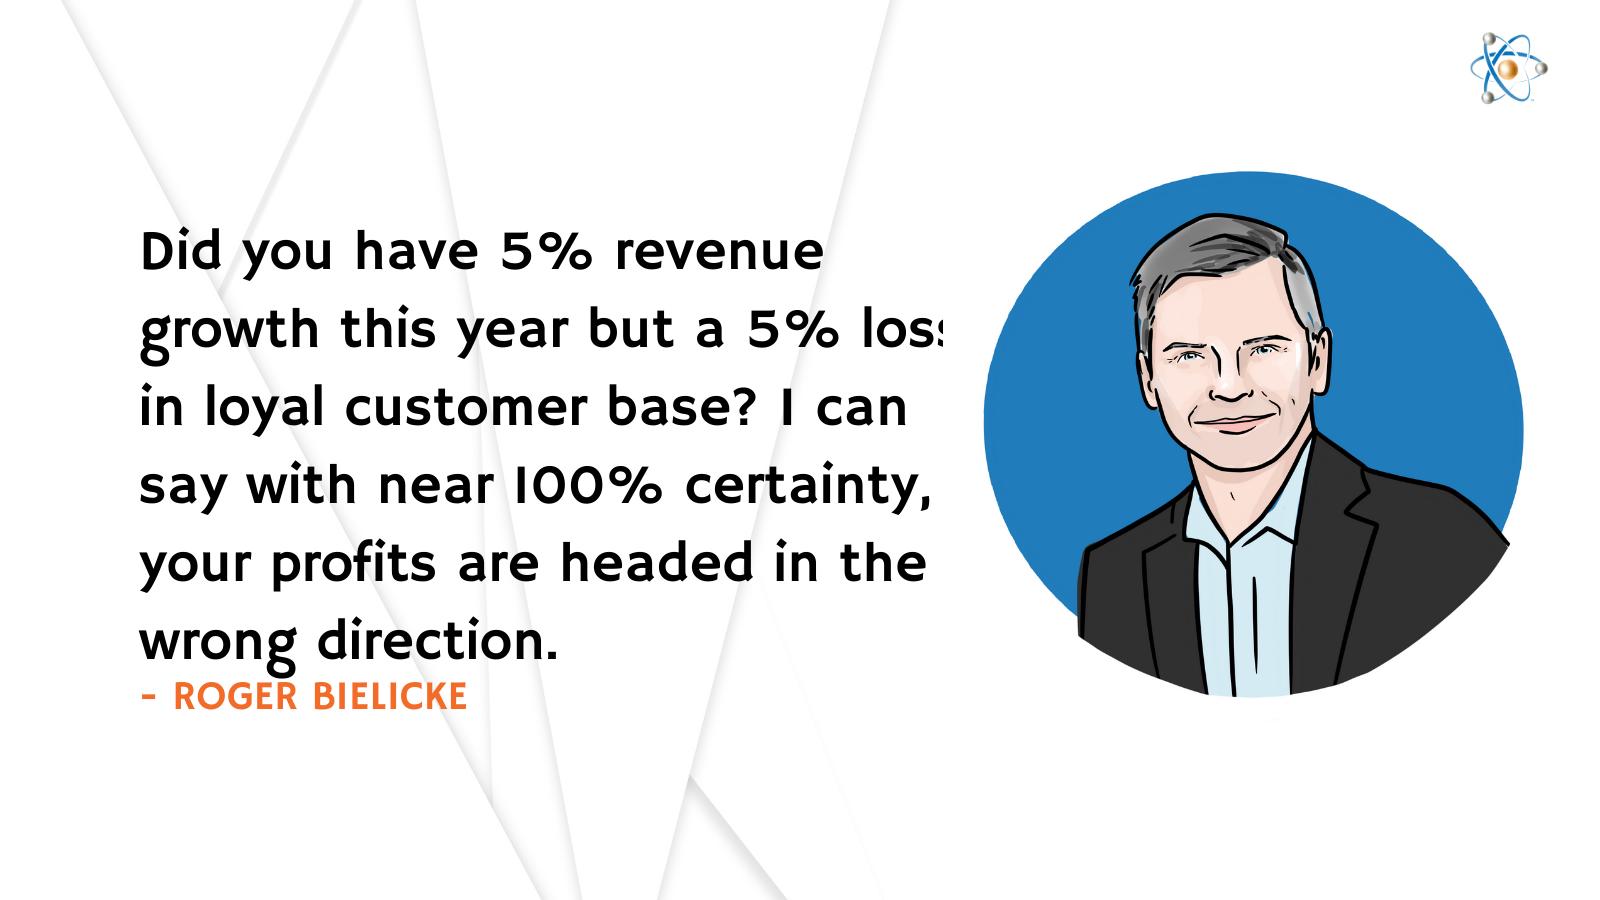 5% revenue growth loyal customer base loss customer success quotes roger bielicke atomic revenue